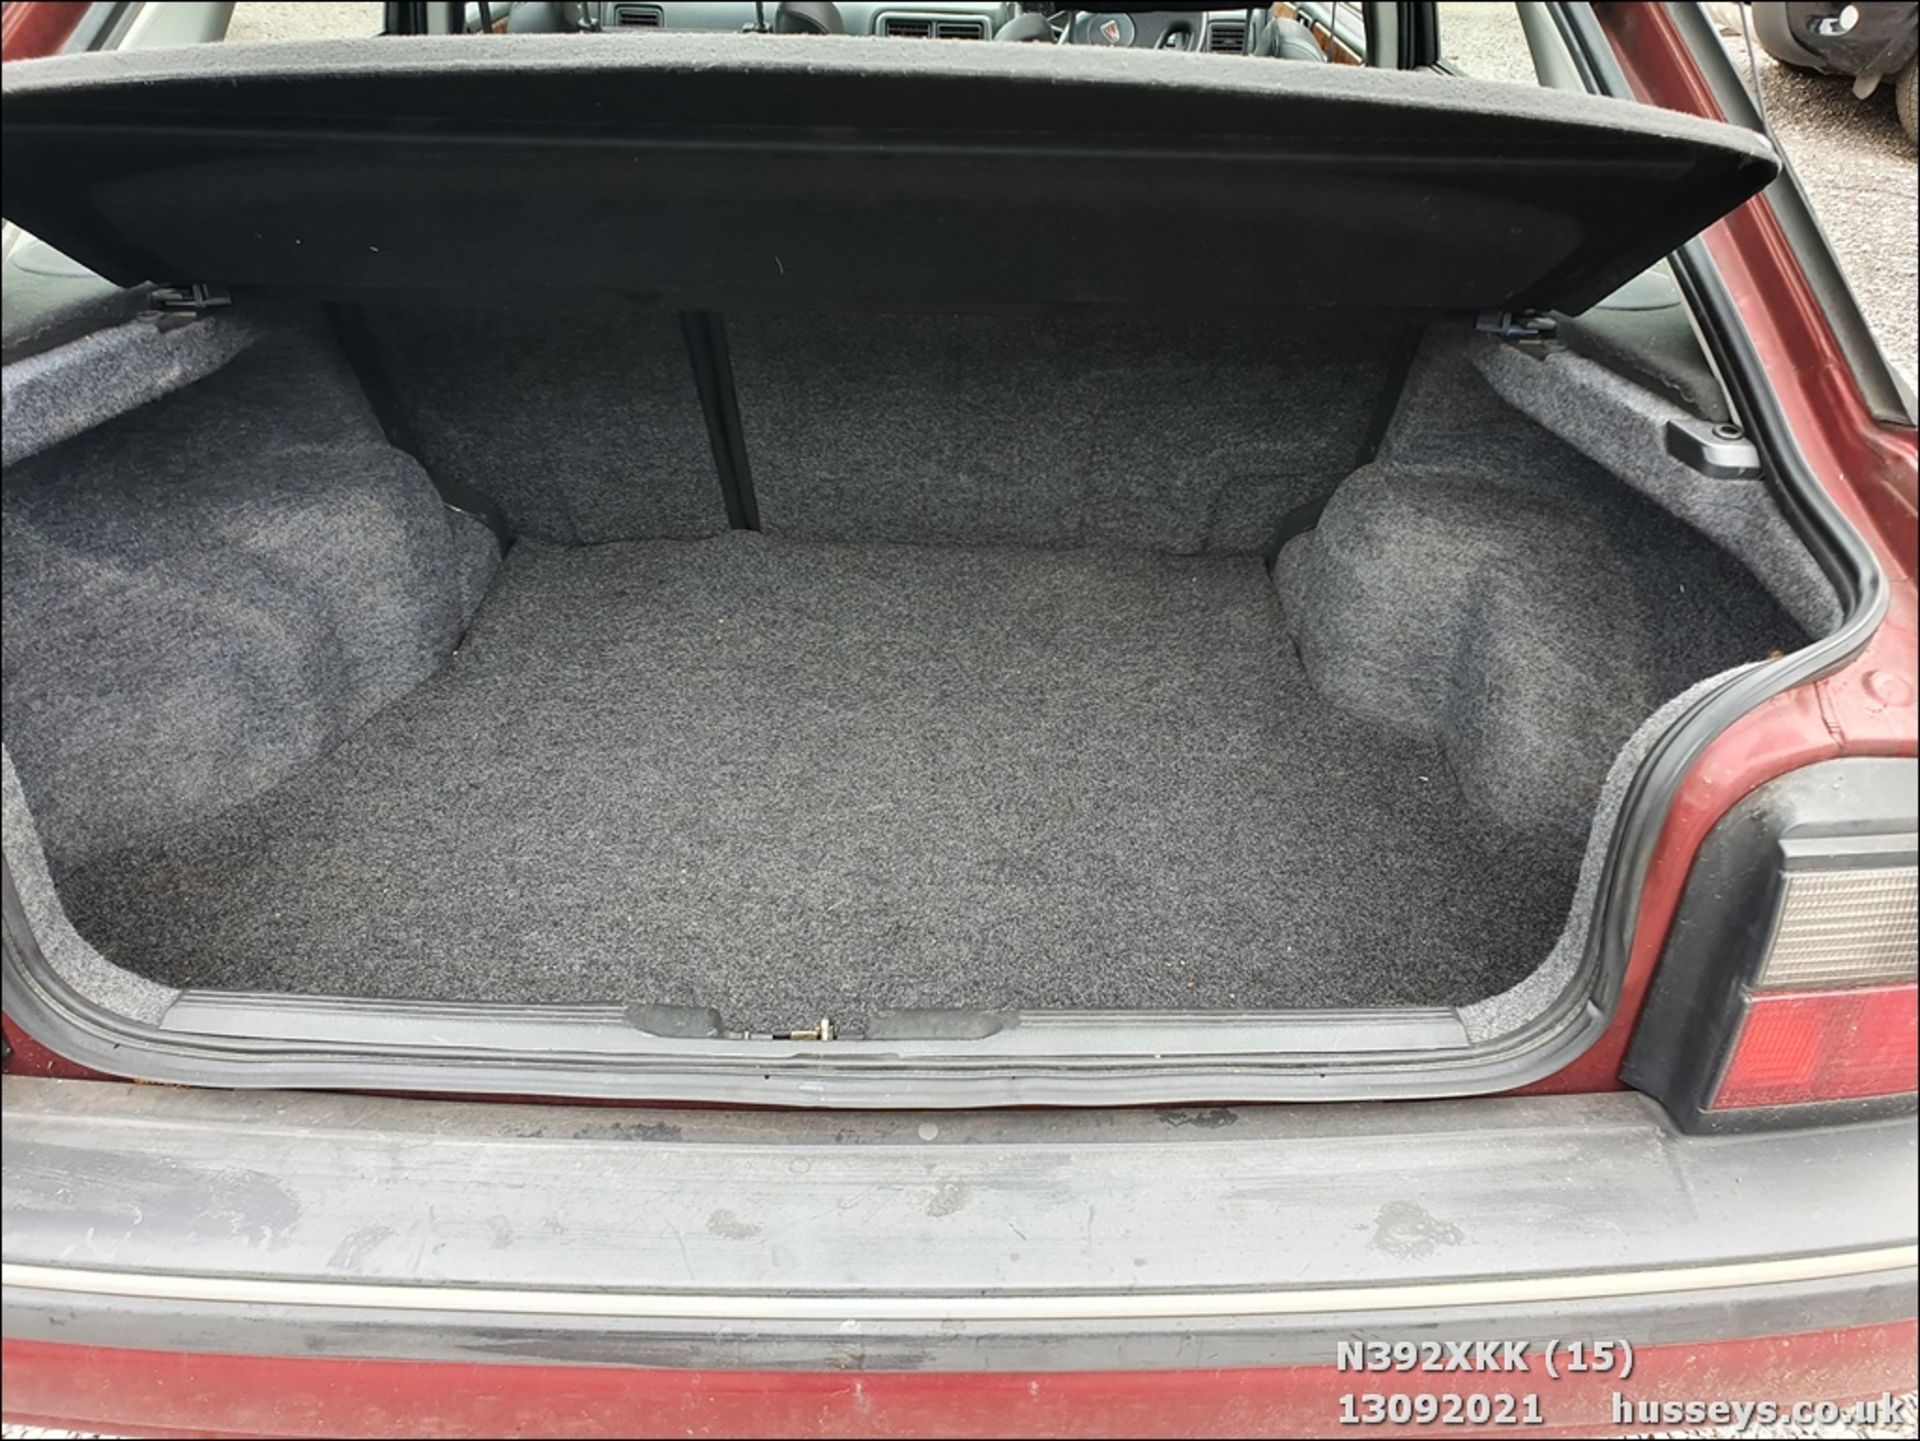 1995 ROVER 214 SEI - 1396cc 5dr Hatchback (Red, 99k) - Image 15 of 15